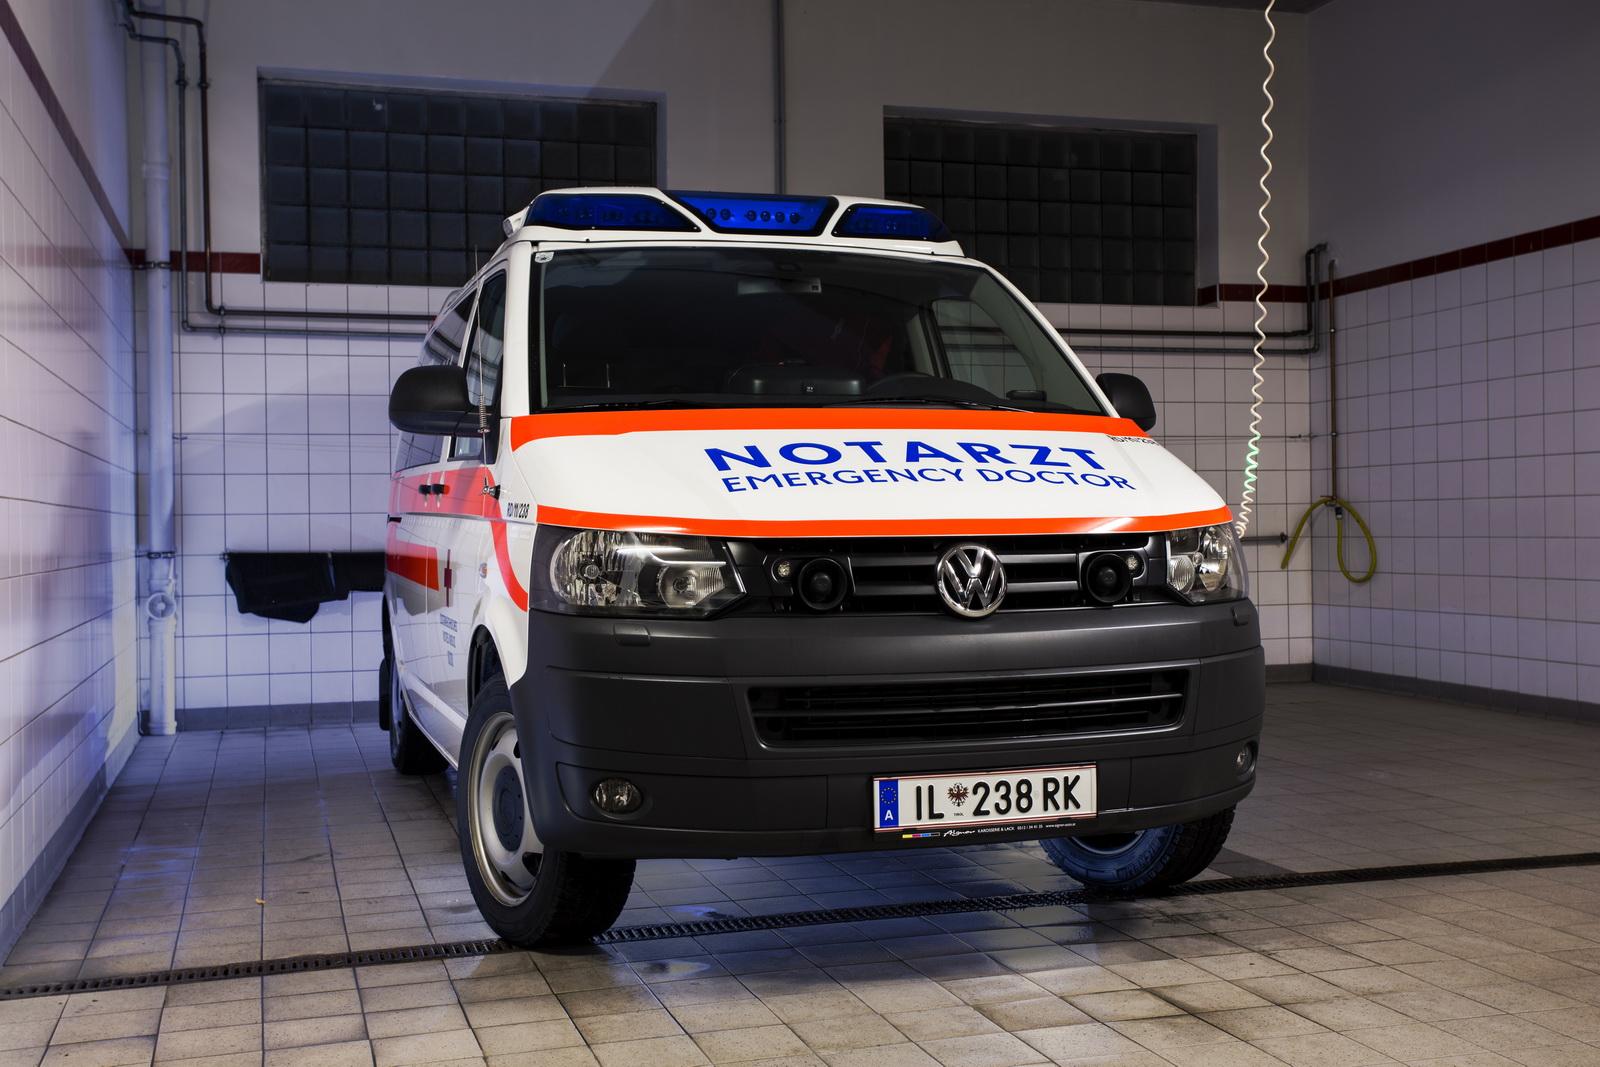 Notartz System Mayrhofen / Emergency Doctor's Vehicle